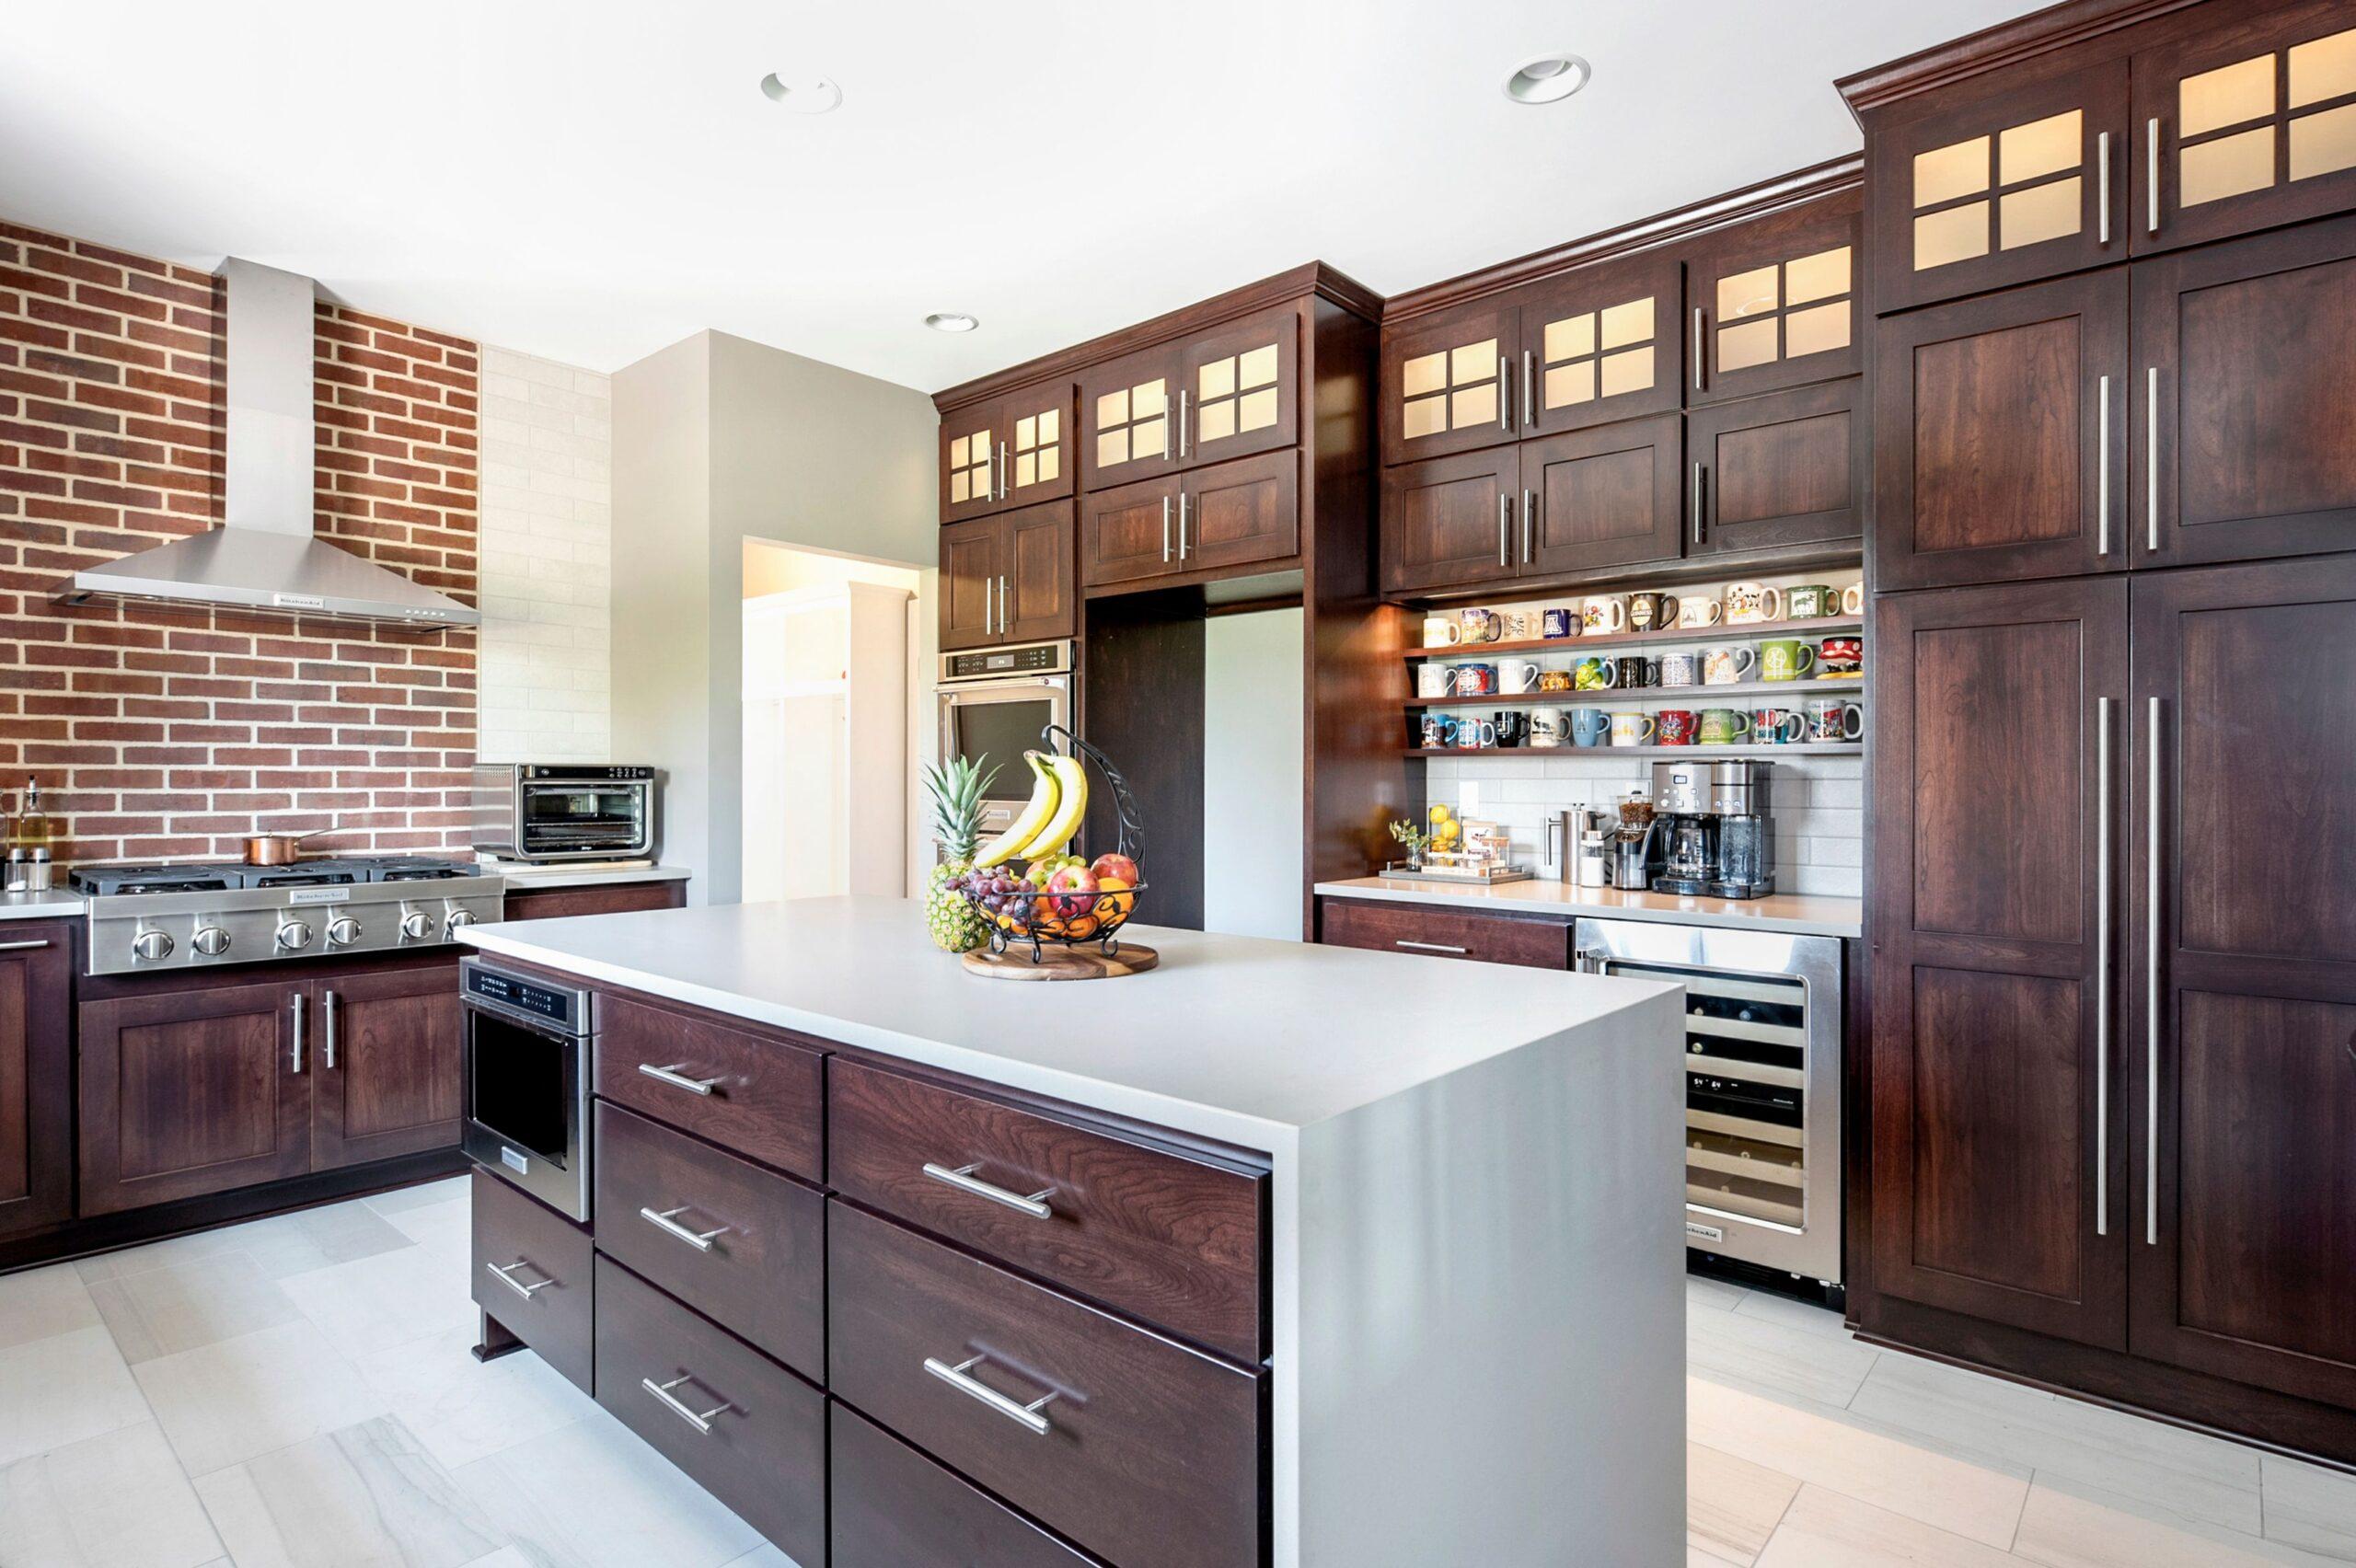 Let's Talk Layered Kitchen Lighting